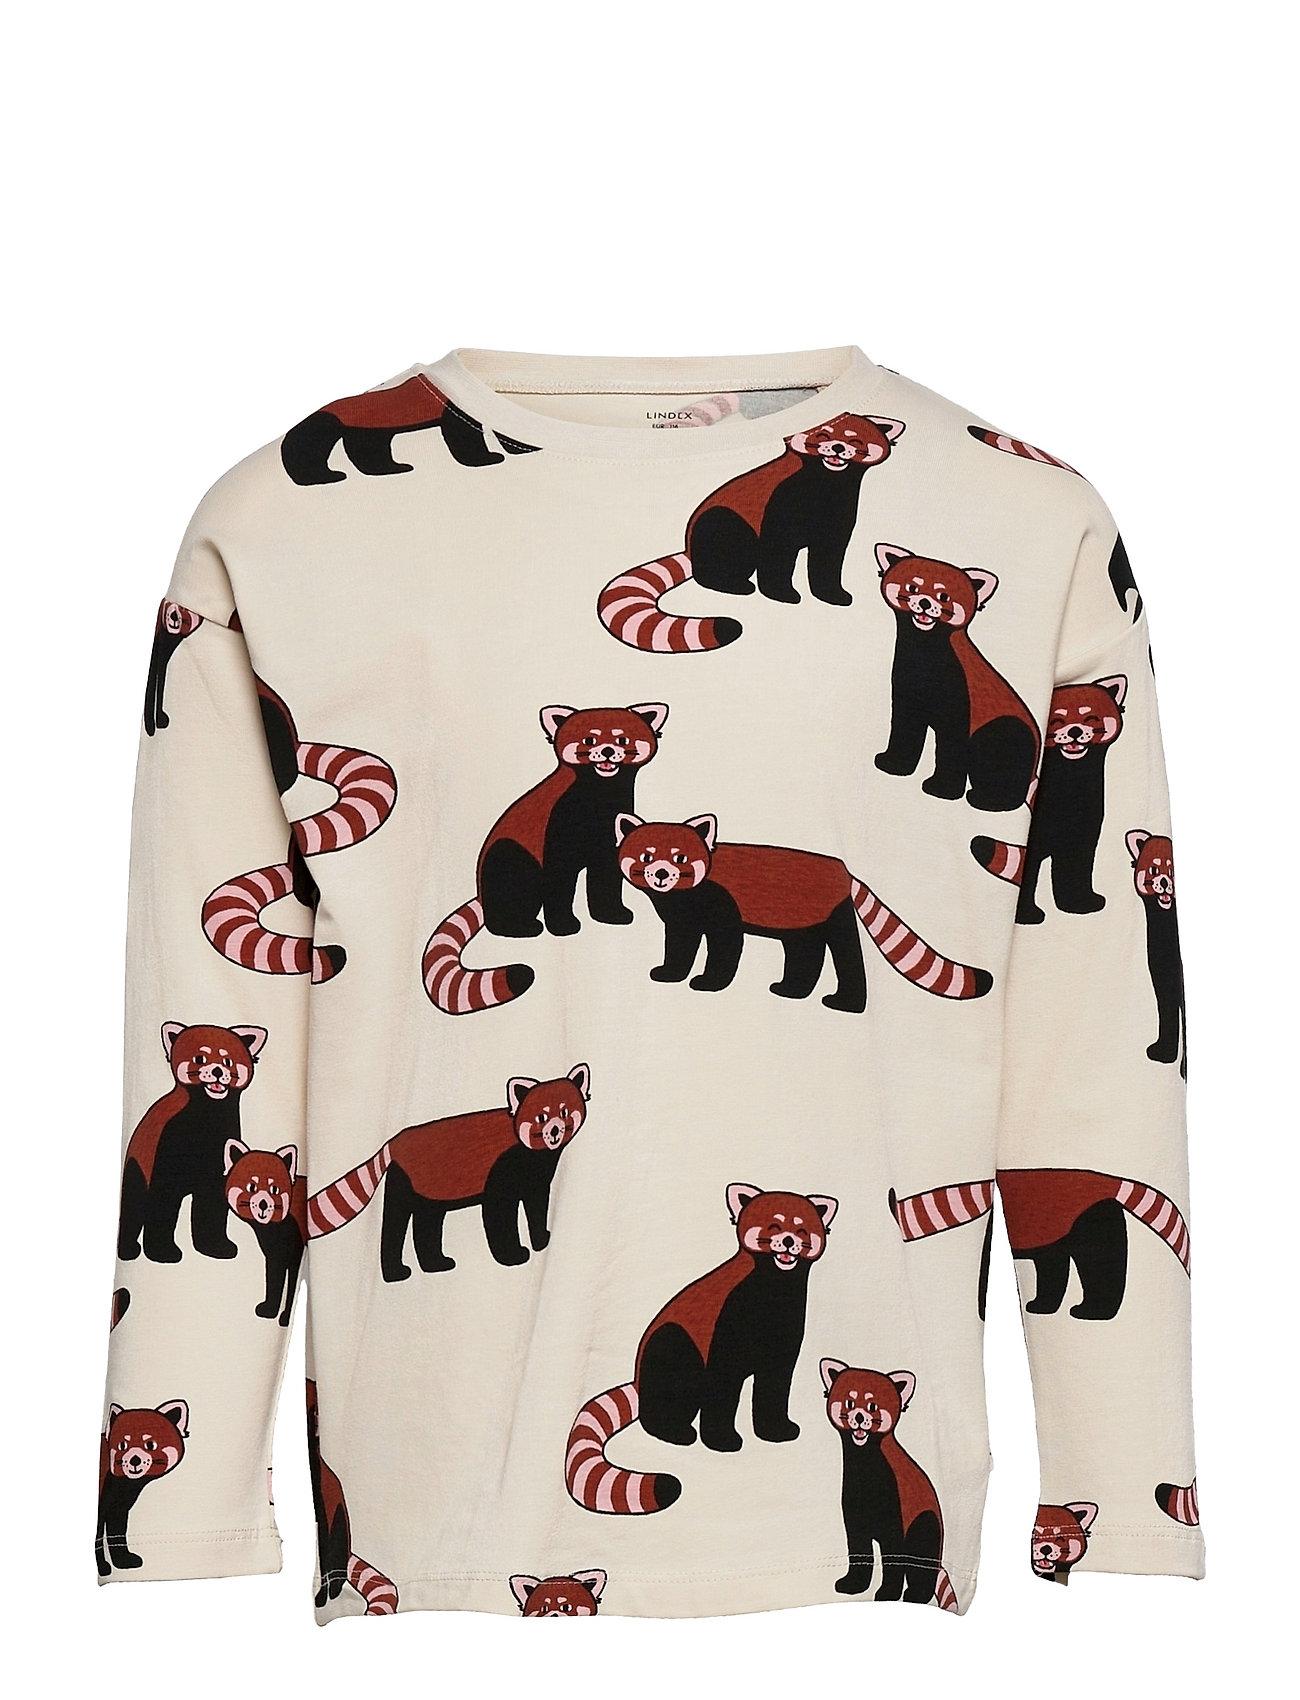 Top Red Panda Aop Langærmet T-shirt Multi/mønstret Lindex